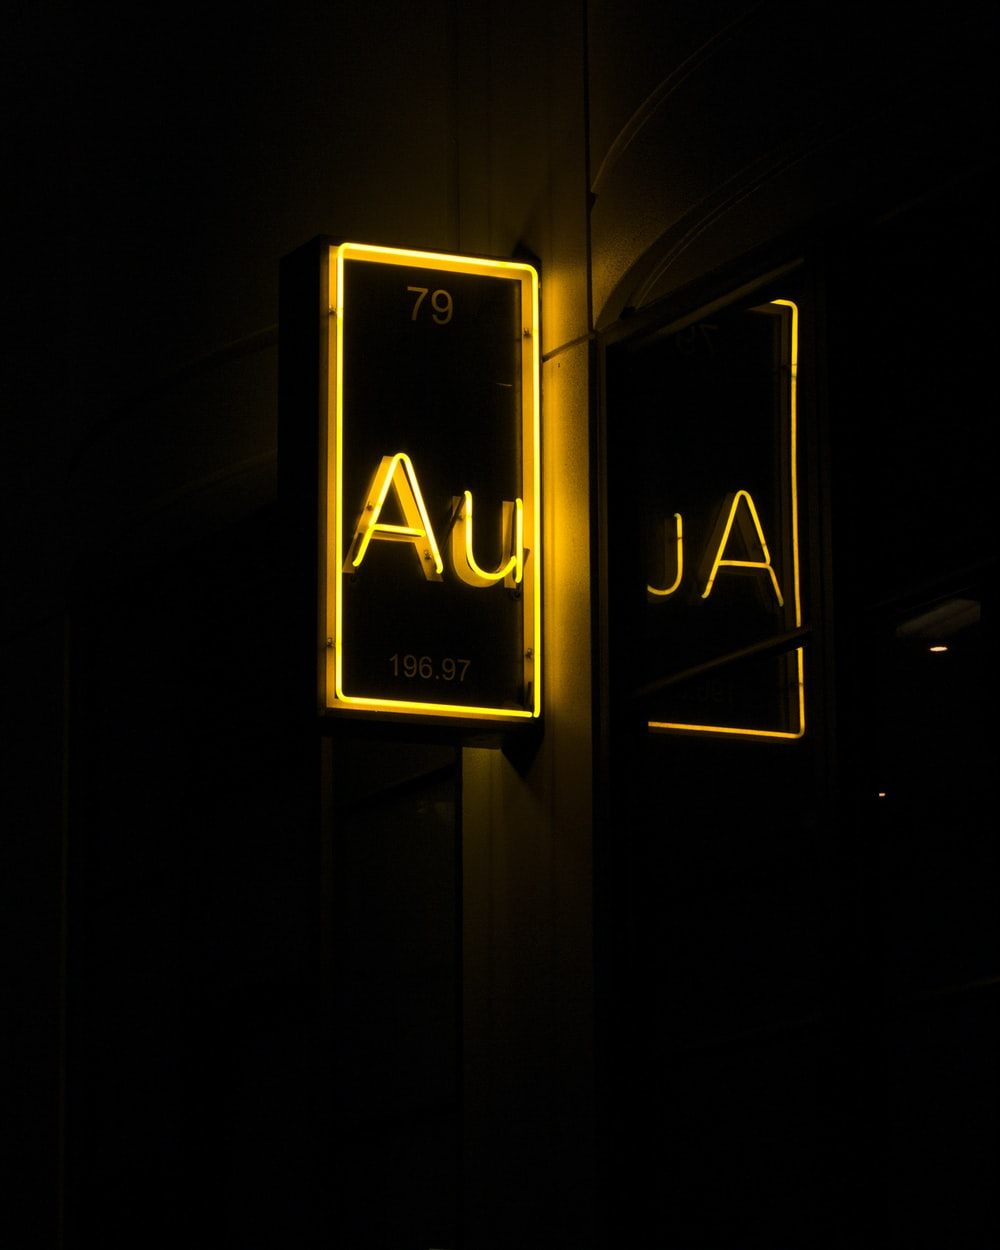 yellow Au neon light signage